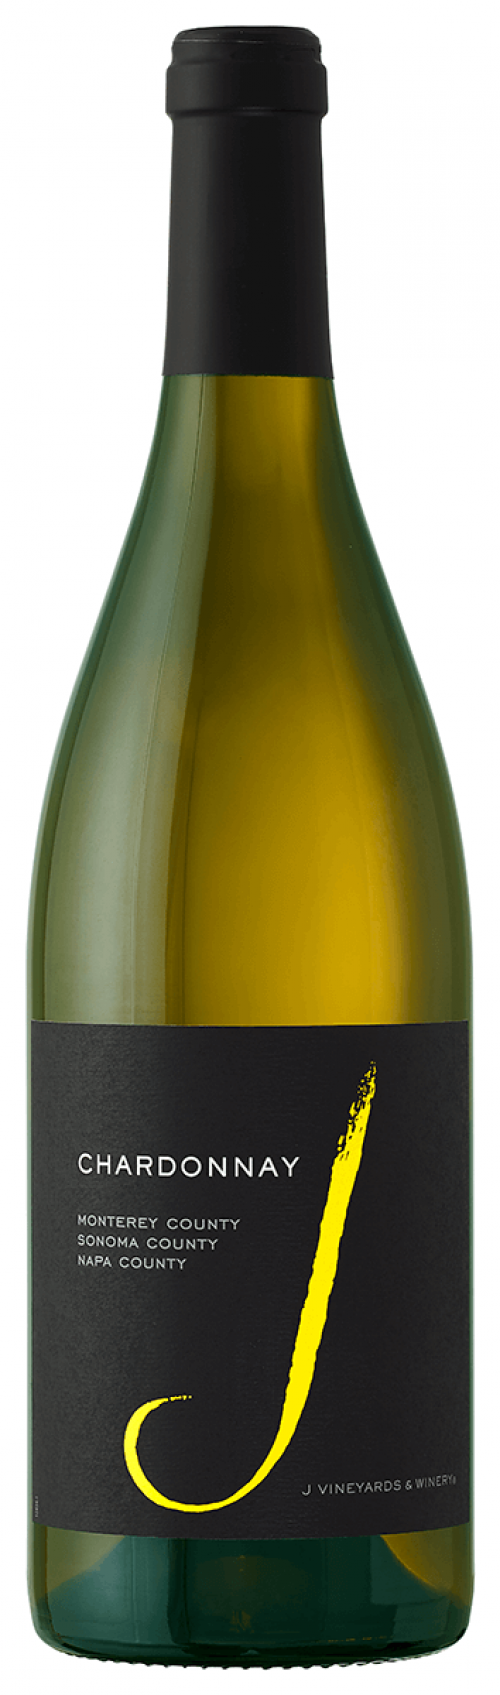 2017 J Vineyards Chardonnay Multi-County 750ml